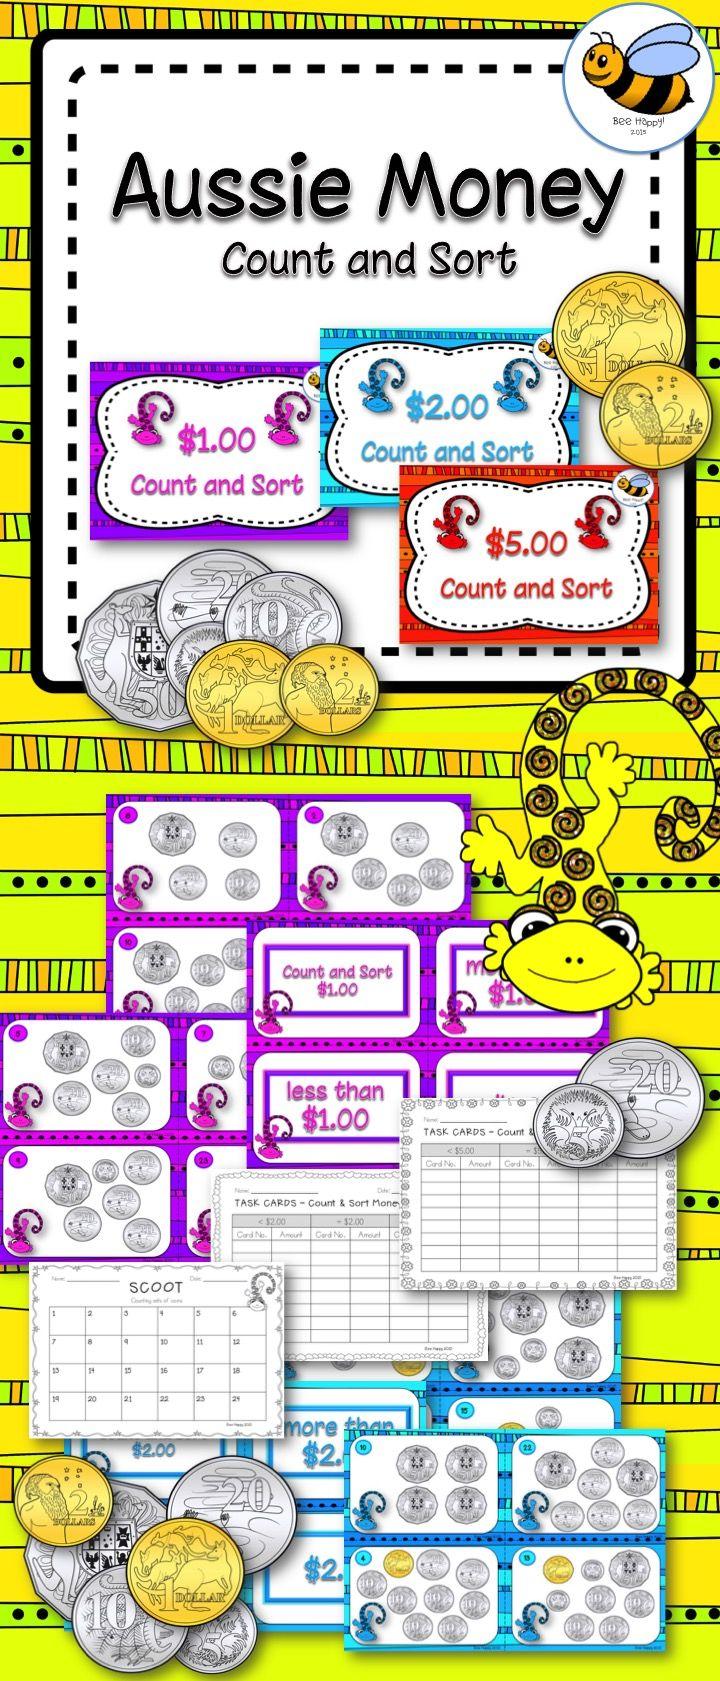 80 best teach money images on pinterest money activities money games and money puns. Black Bedroom Furniture Sets. Home Design Ideas